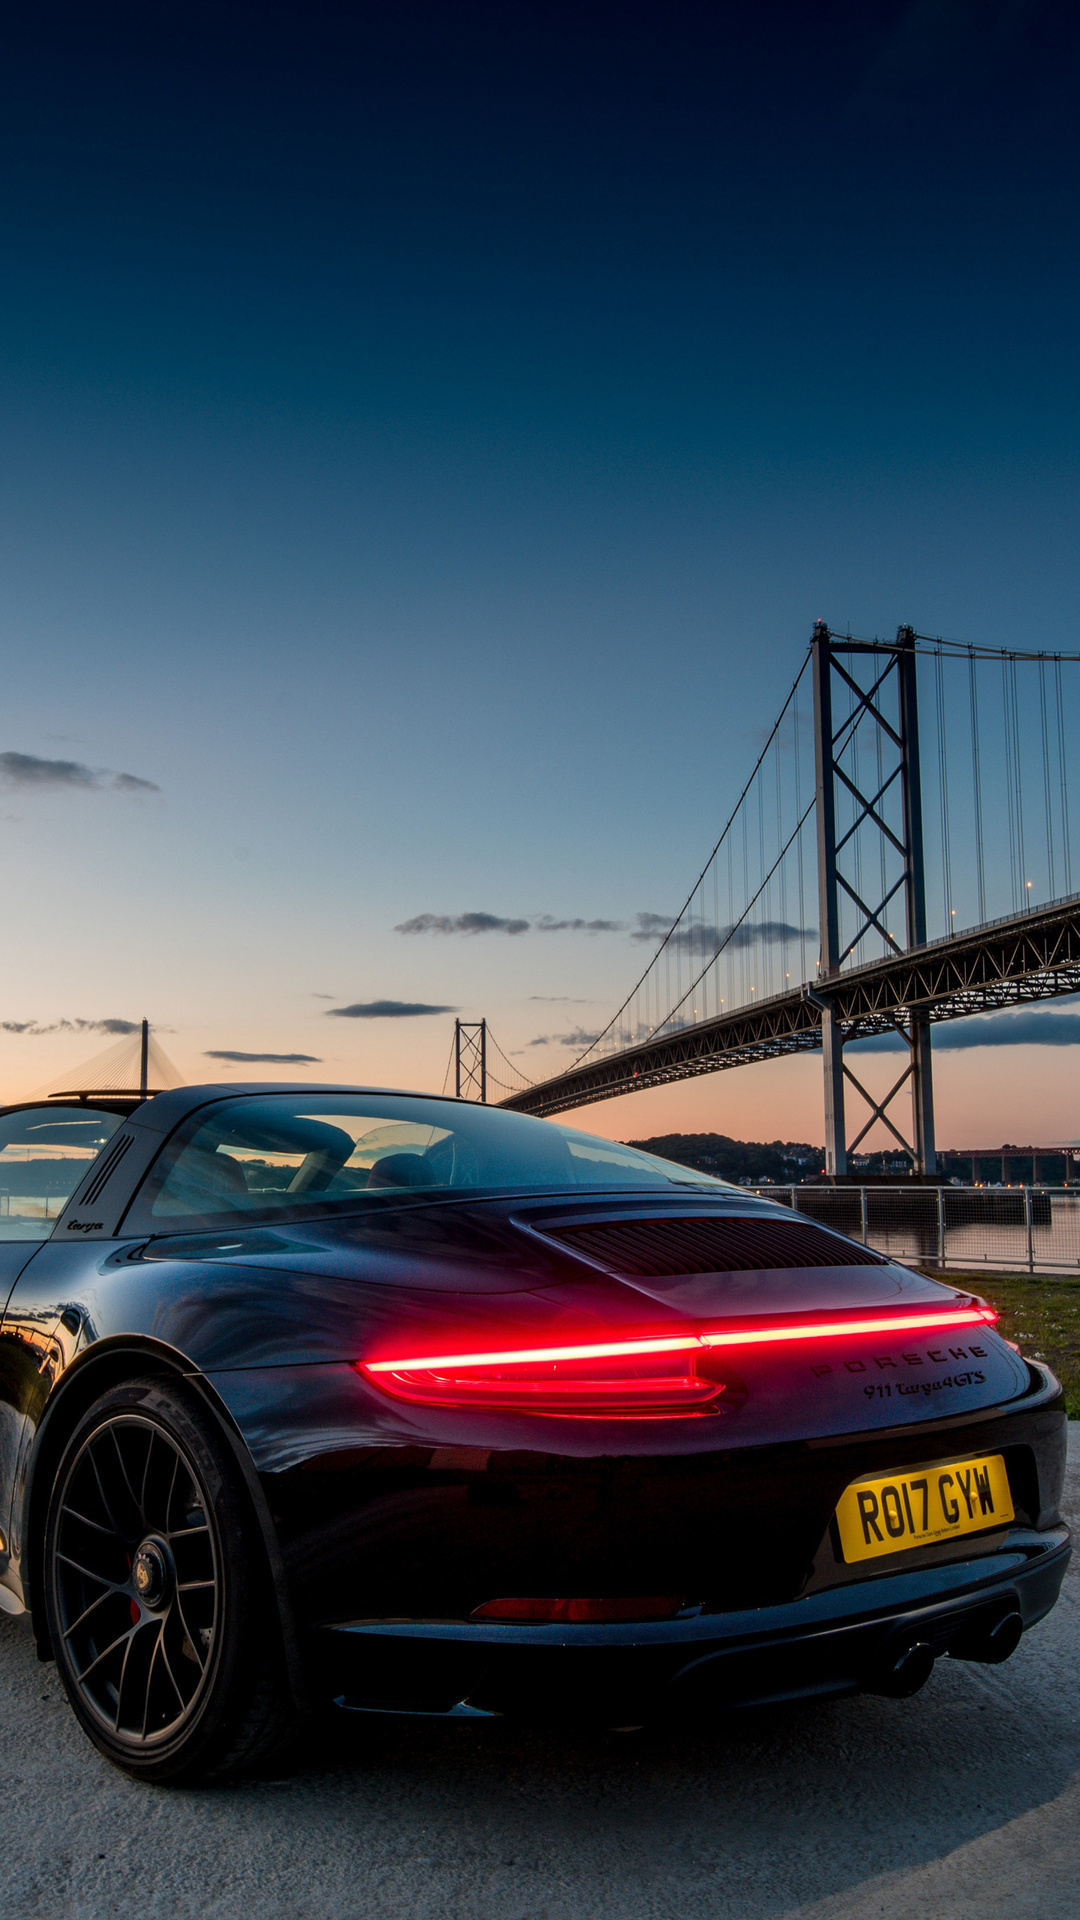 1080x1920 Porsche 911 Targa Iphone 7 6s 6 Plus Pixel Xl